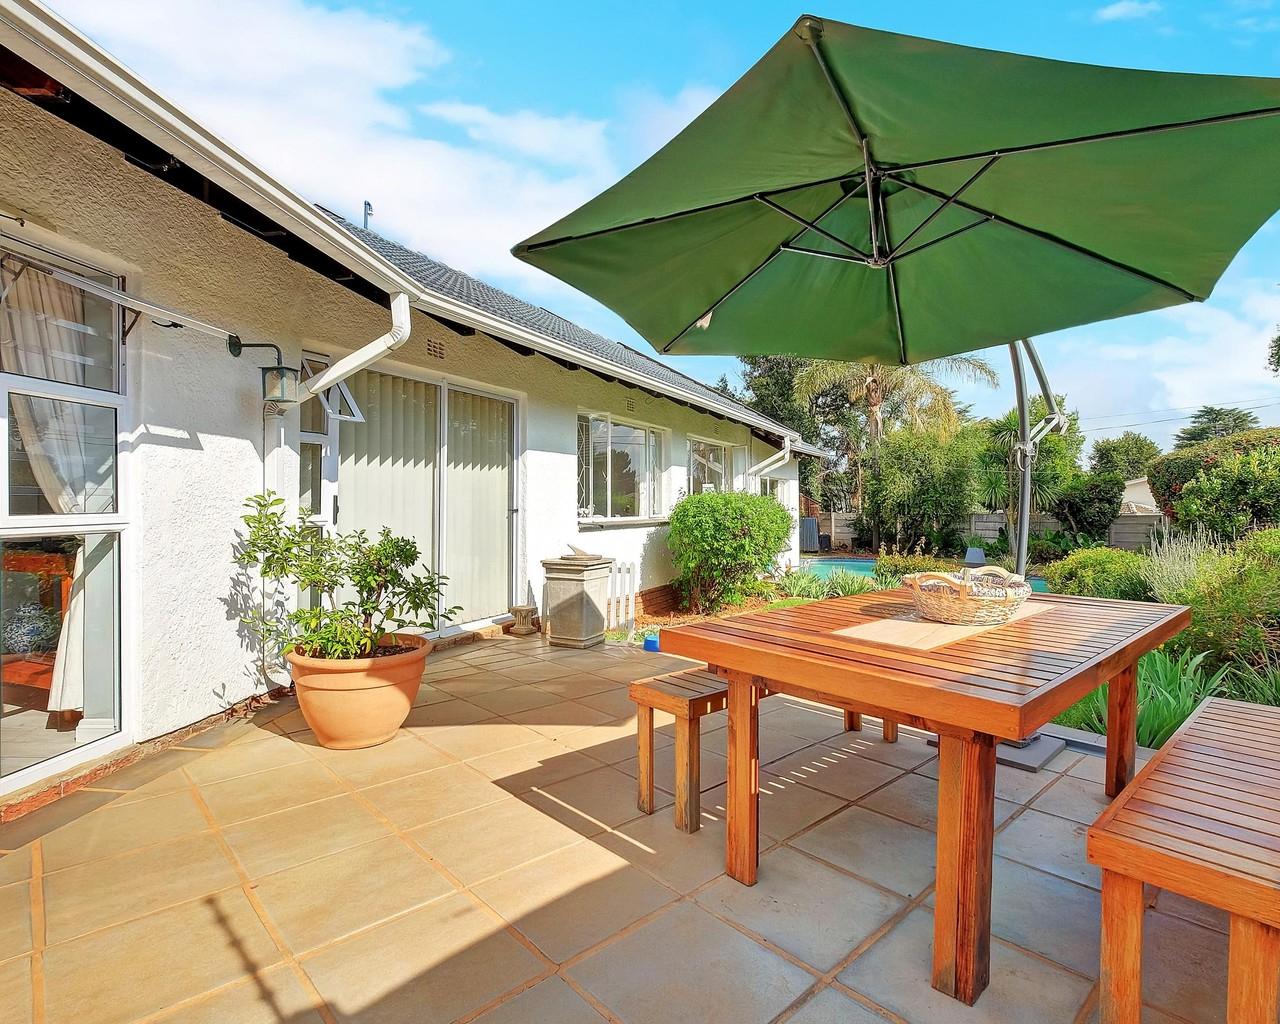 Jawitz Properties Pertaining To Current Leachville Market Umbrellas (View 7 of 20)